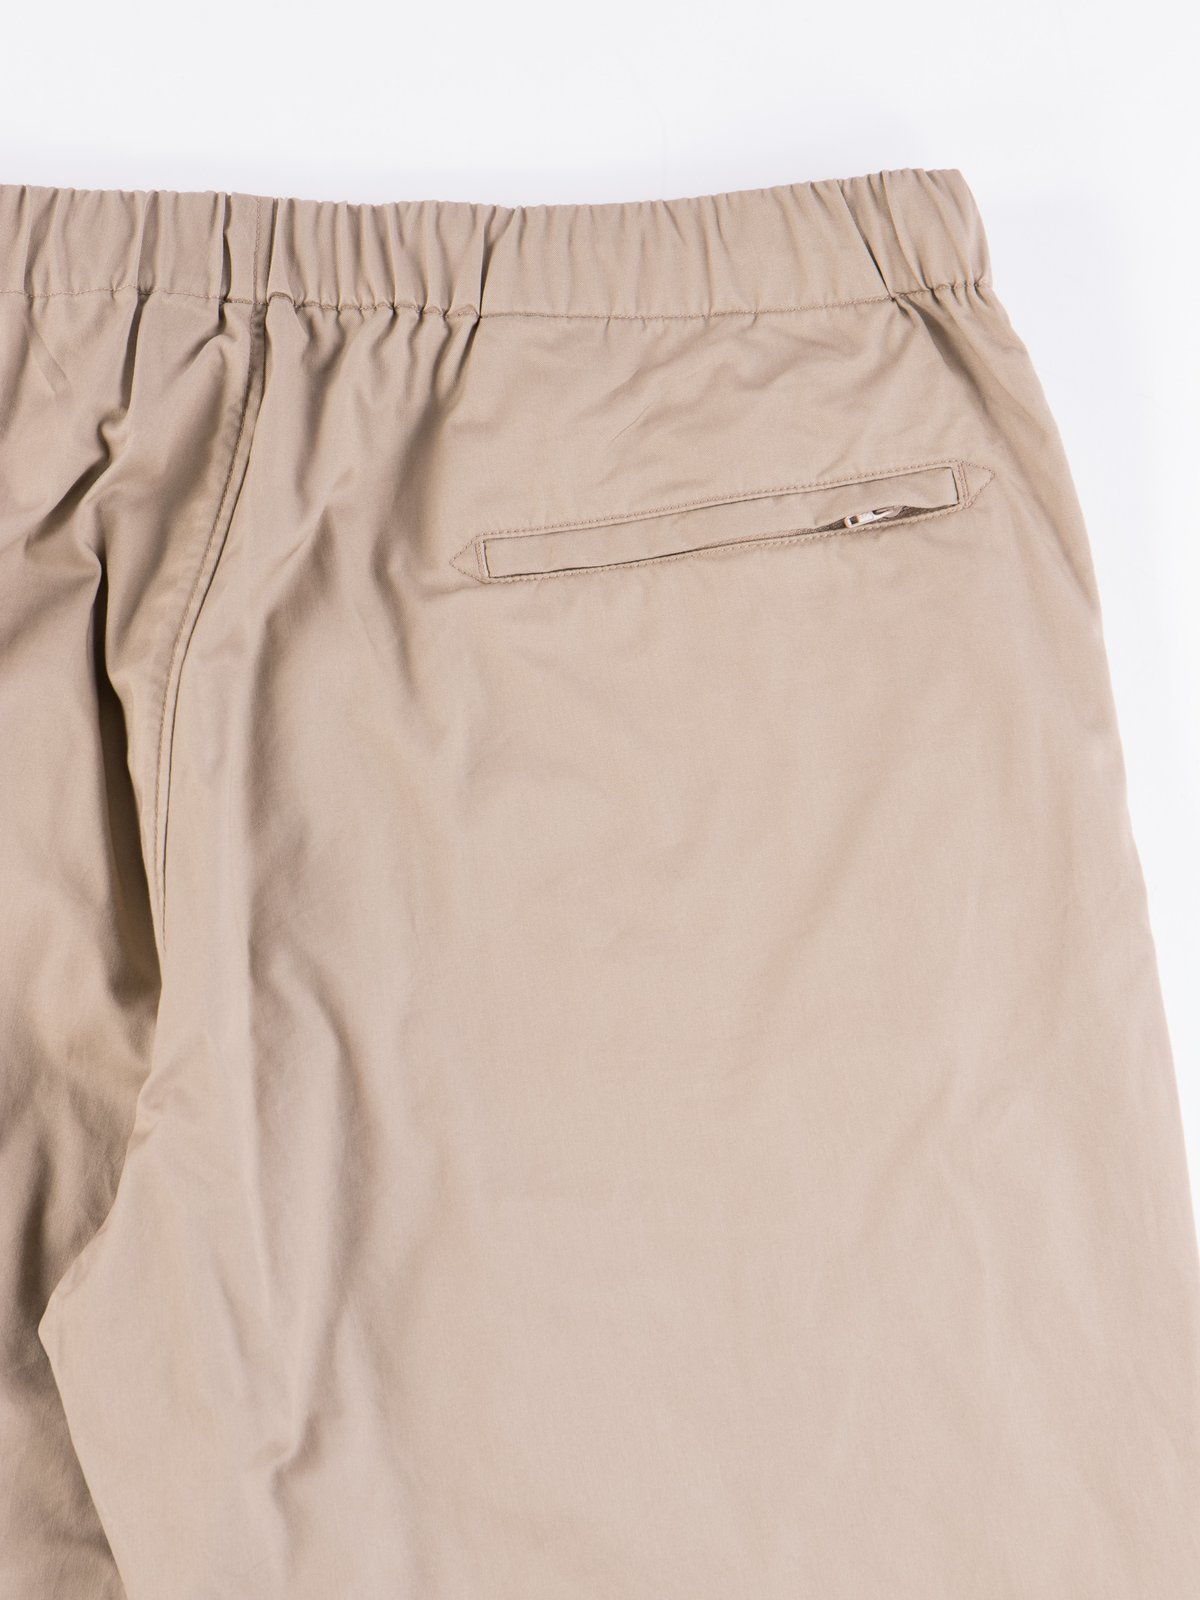 Khaki Highcount Twill Drawstring Pant - Image 6